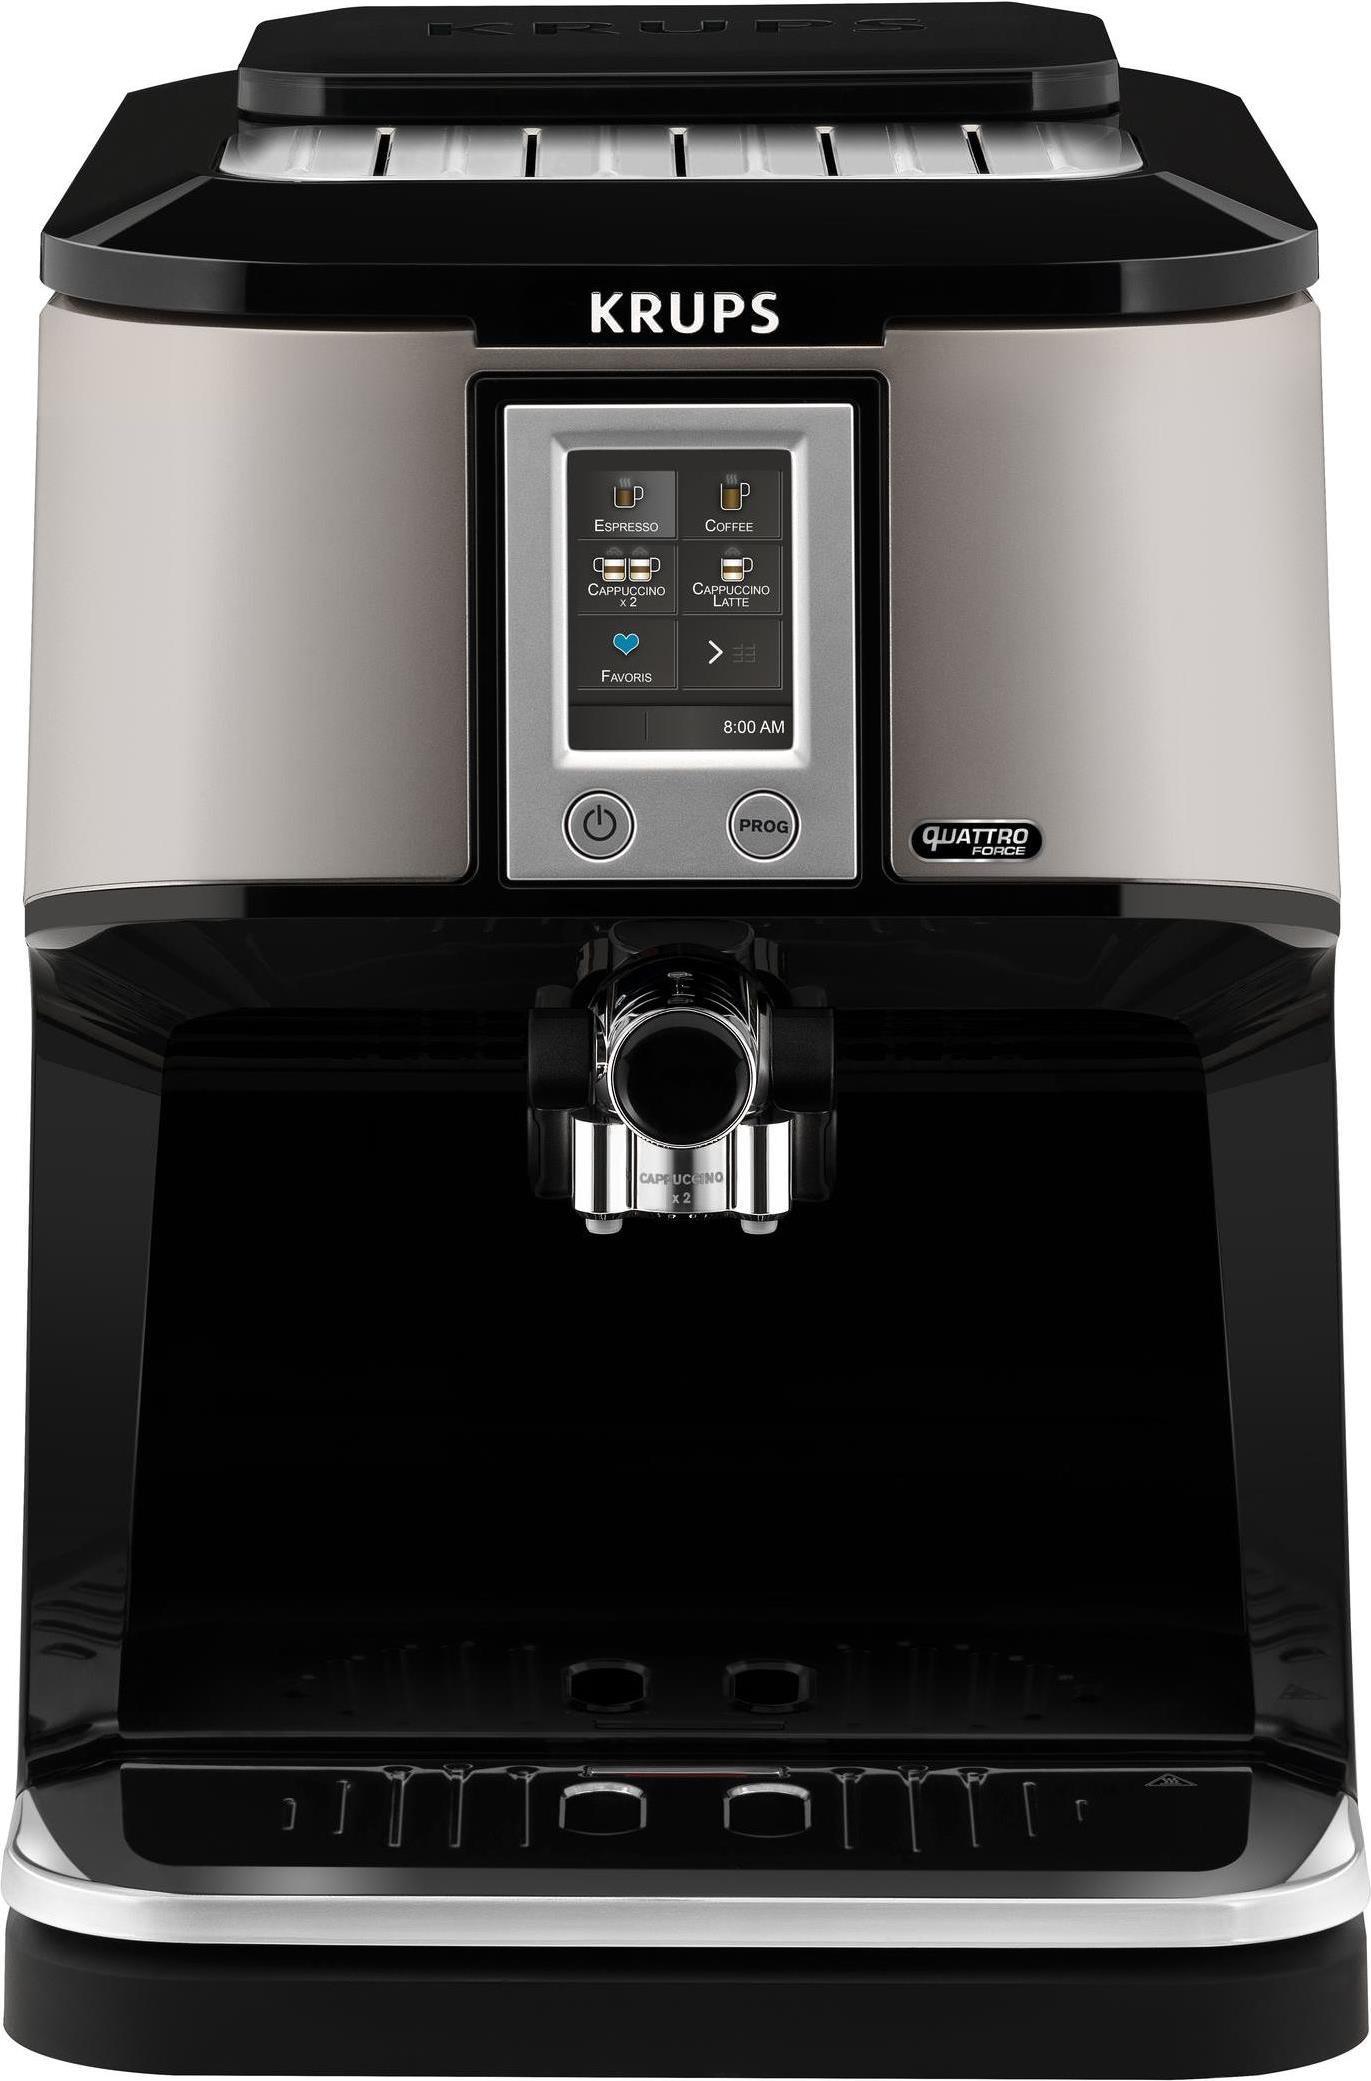 Kaffee, Tee - Krups EA880E Kaffeemaschine Freistehend Espressomaschine Silber 1,7 l 12 Tassen Vollautomatisch (EA 880E)  - Onlineshop JACOB Elektronik